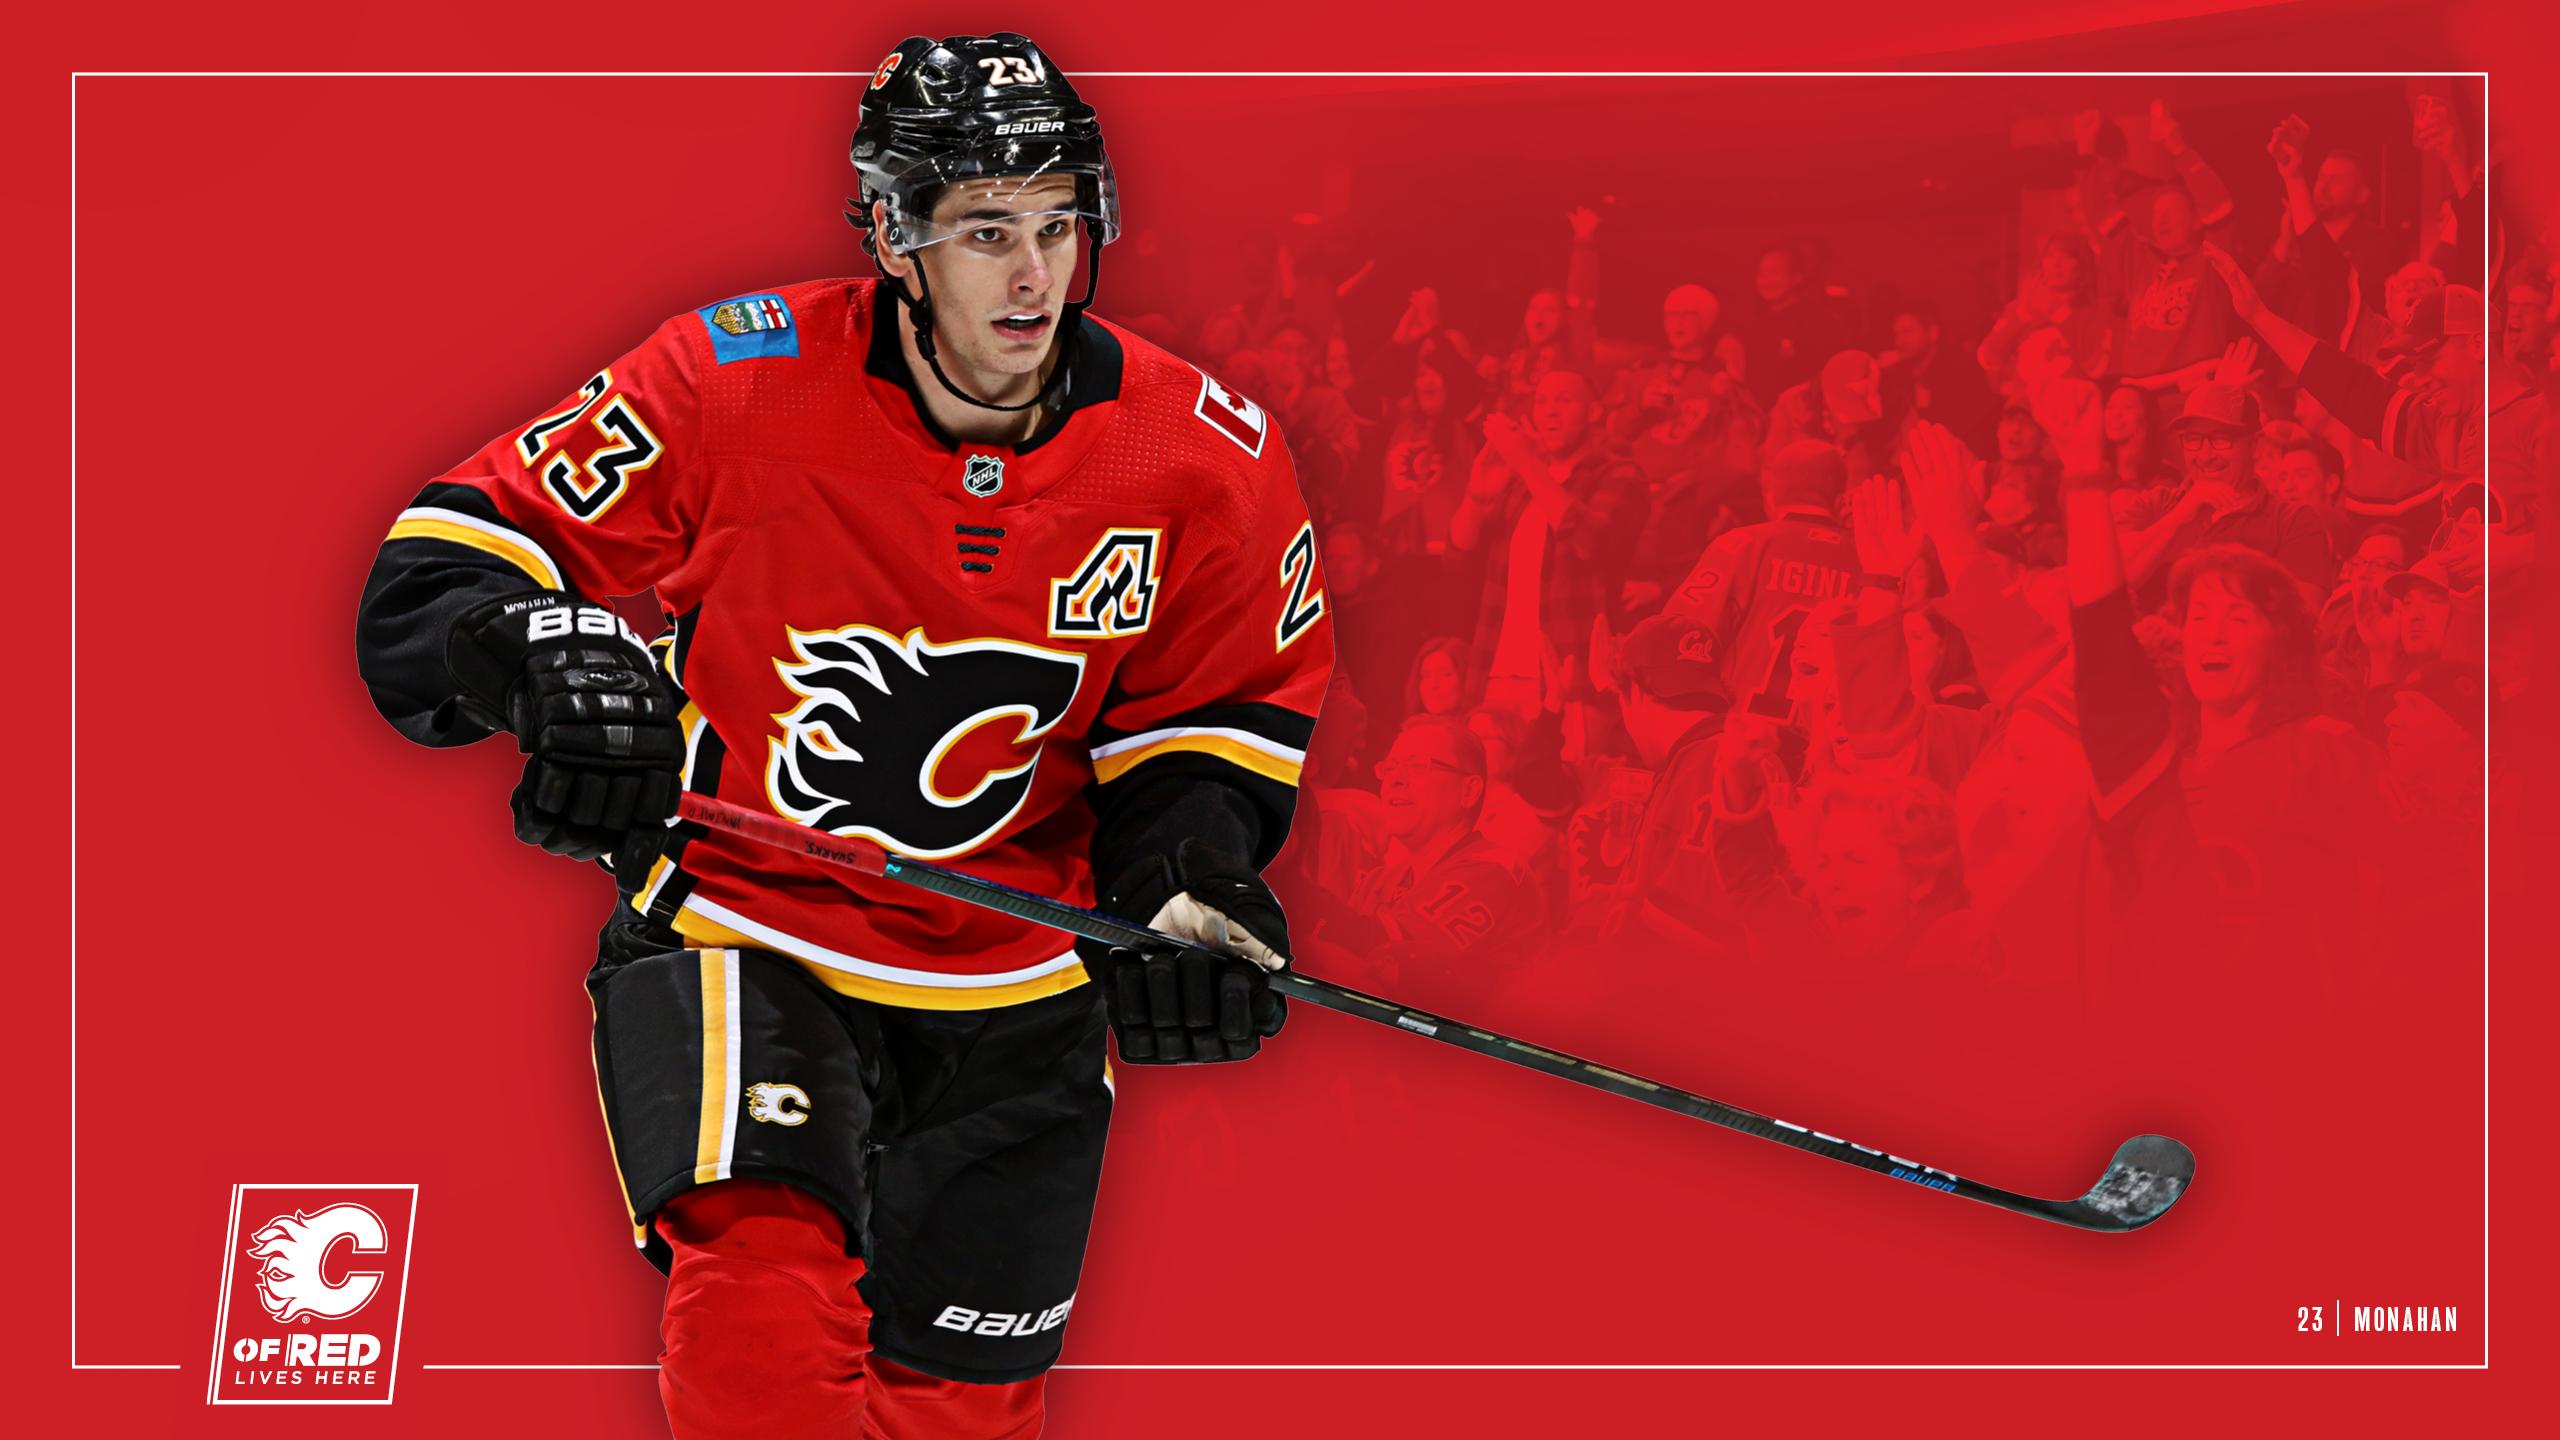 Calgary Flames Wallpaper Macbook 482899 Hd Wallpaper Backgrounds Download